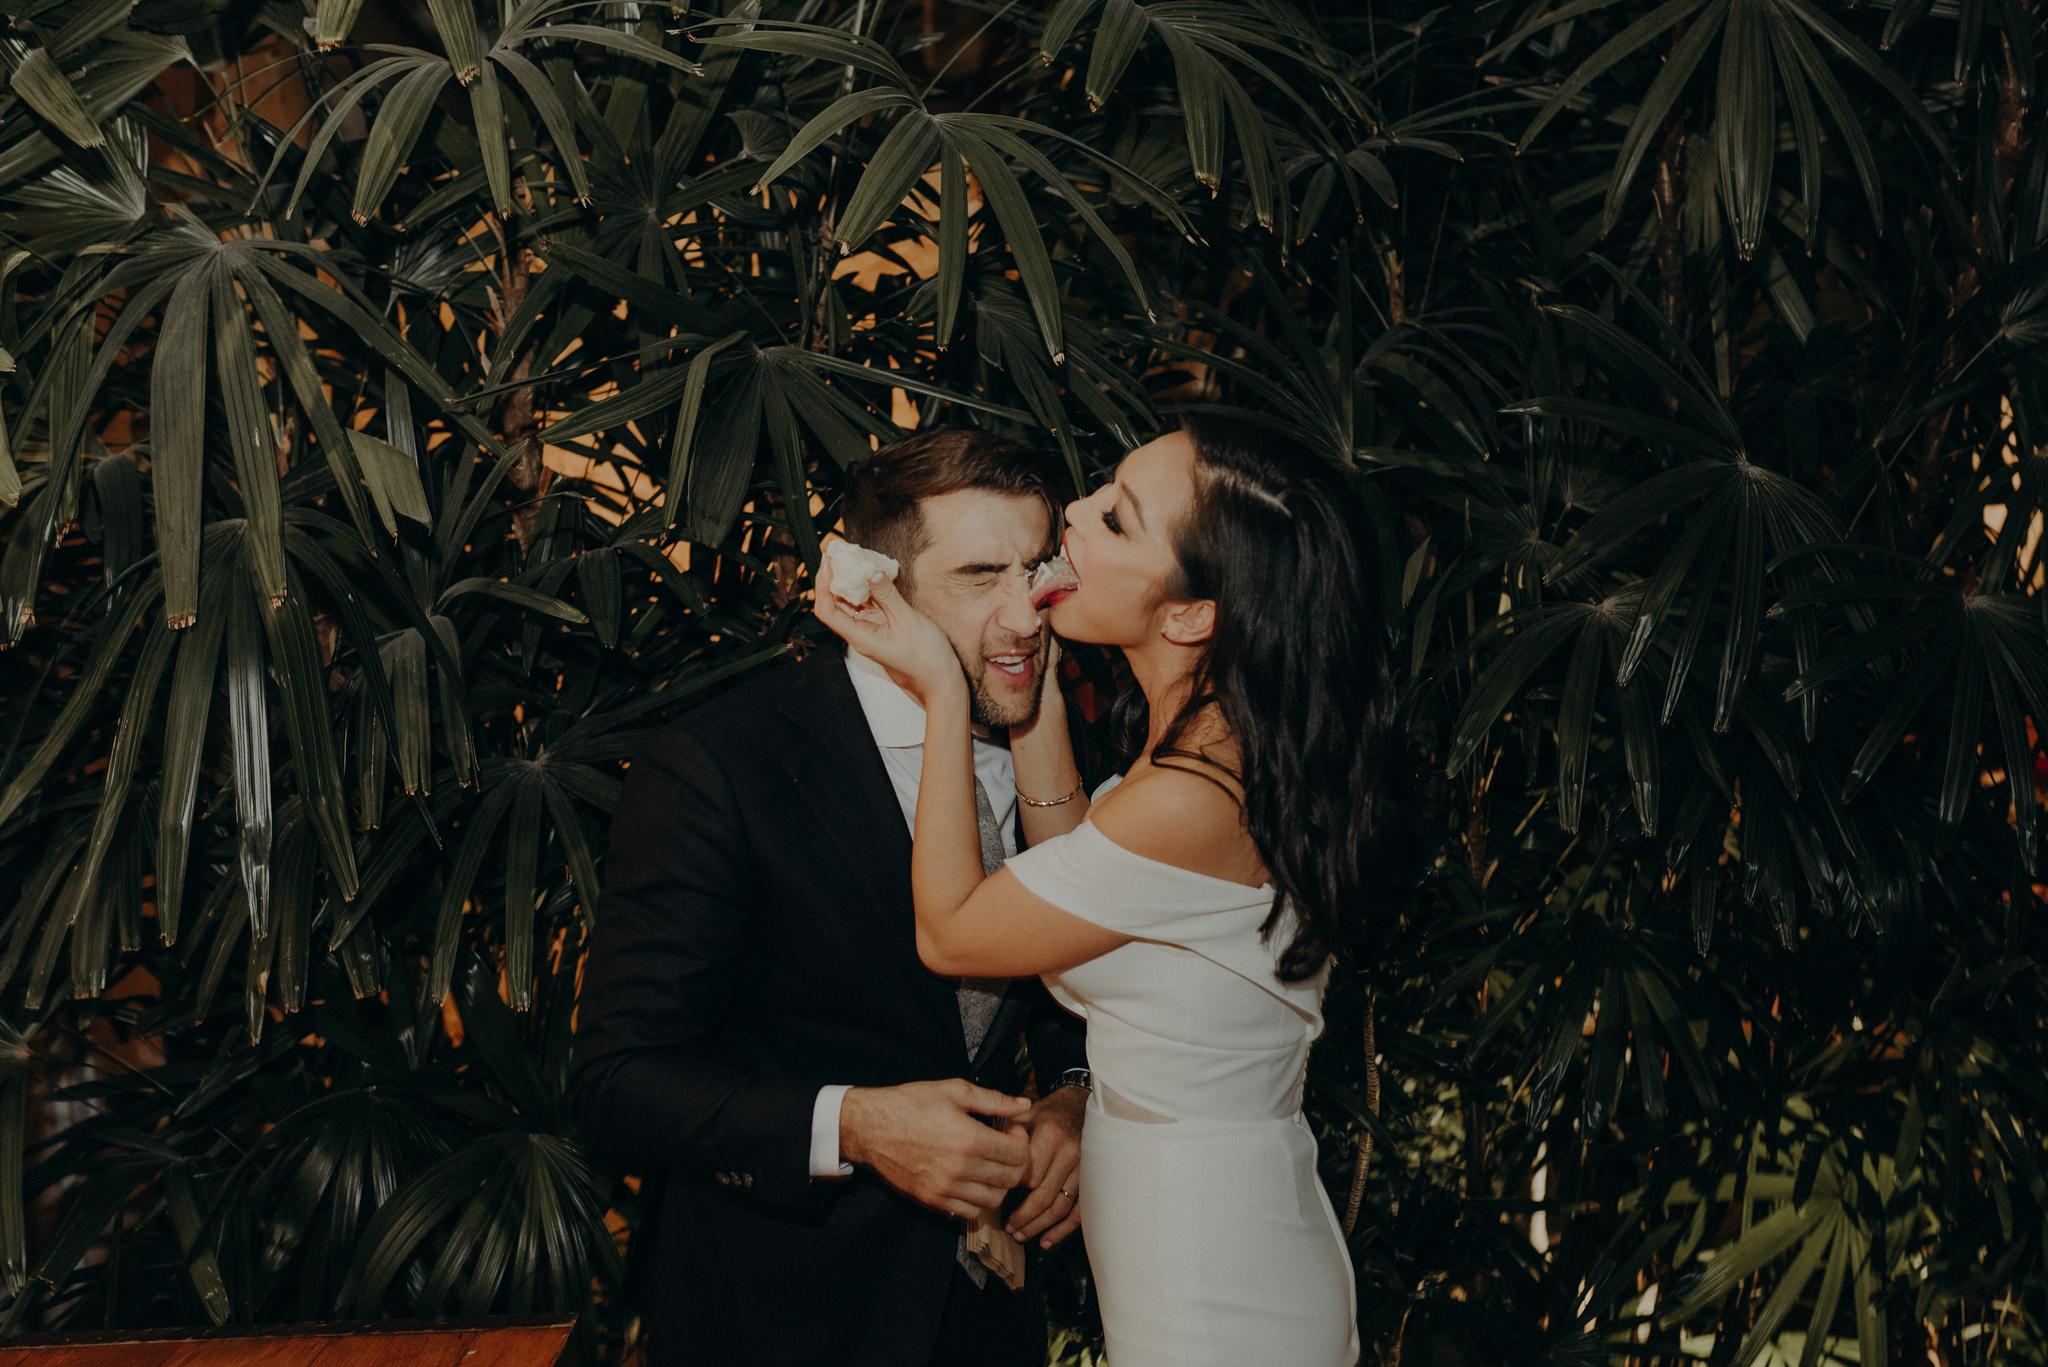 Wedding Photo LA - wedding photographer in los angeles - millwick wedding venue -isaiahandtaylor.com-135.jpg